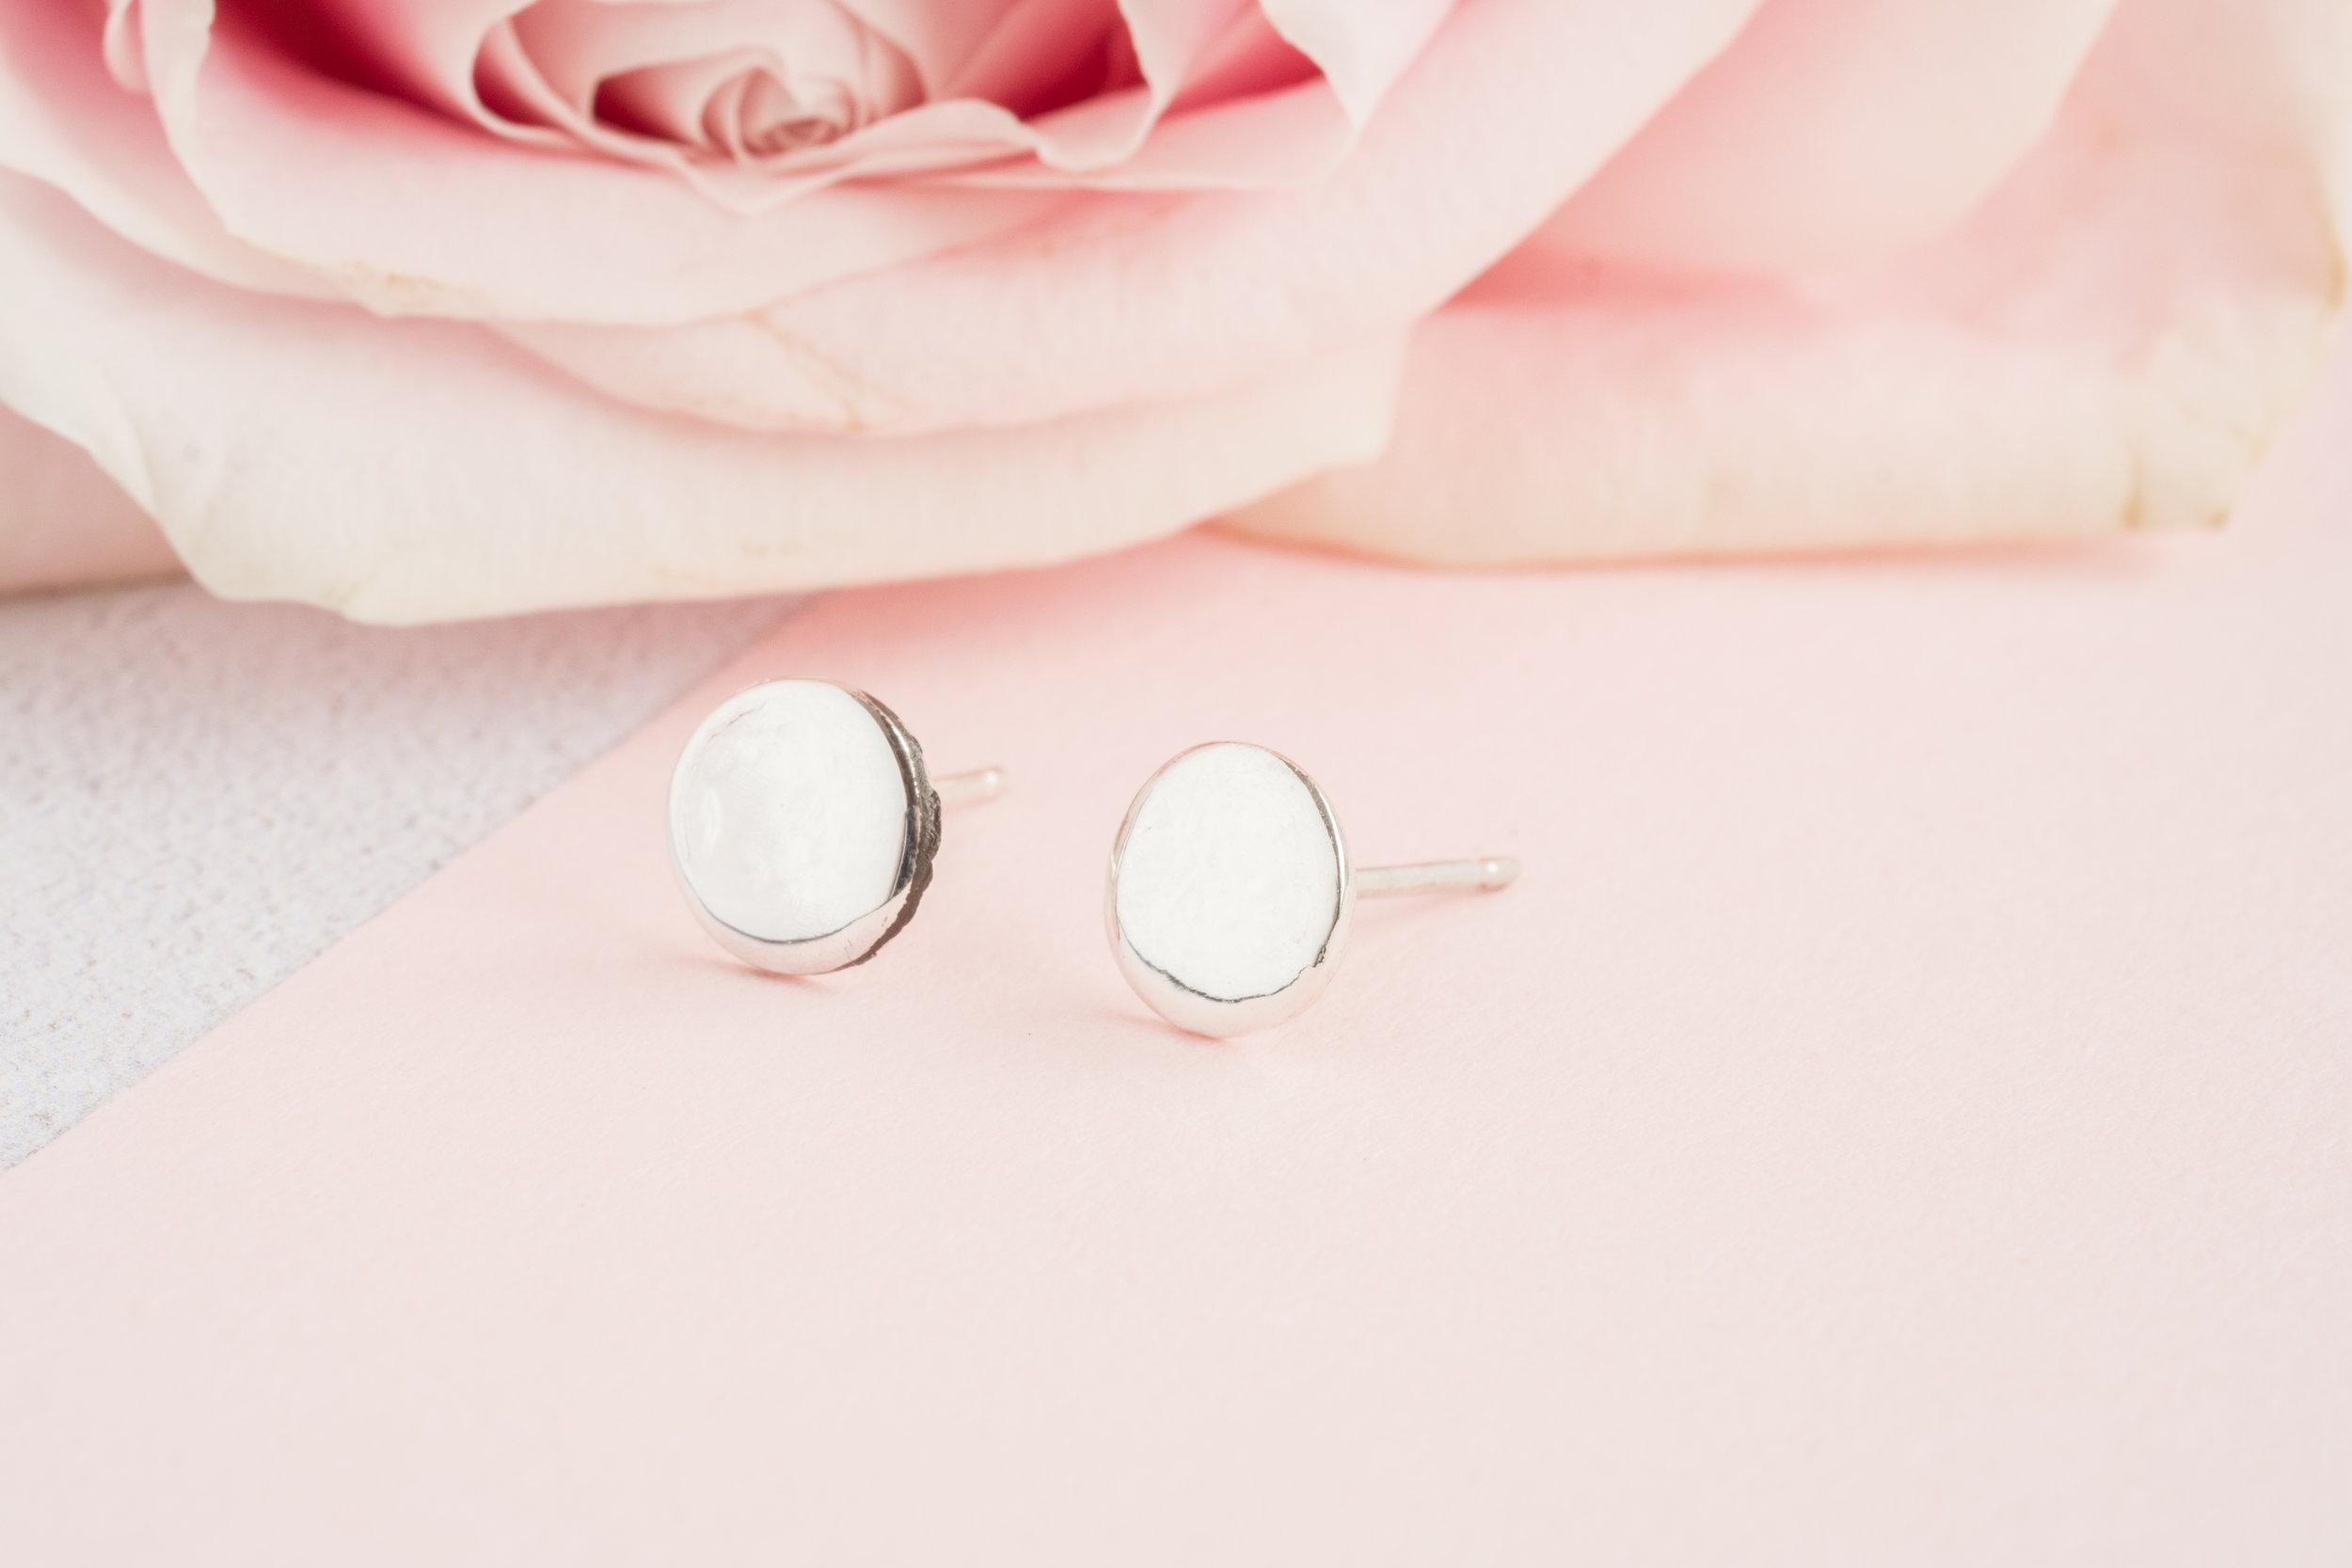 Coin Stud Earrings, £22